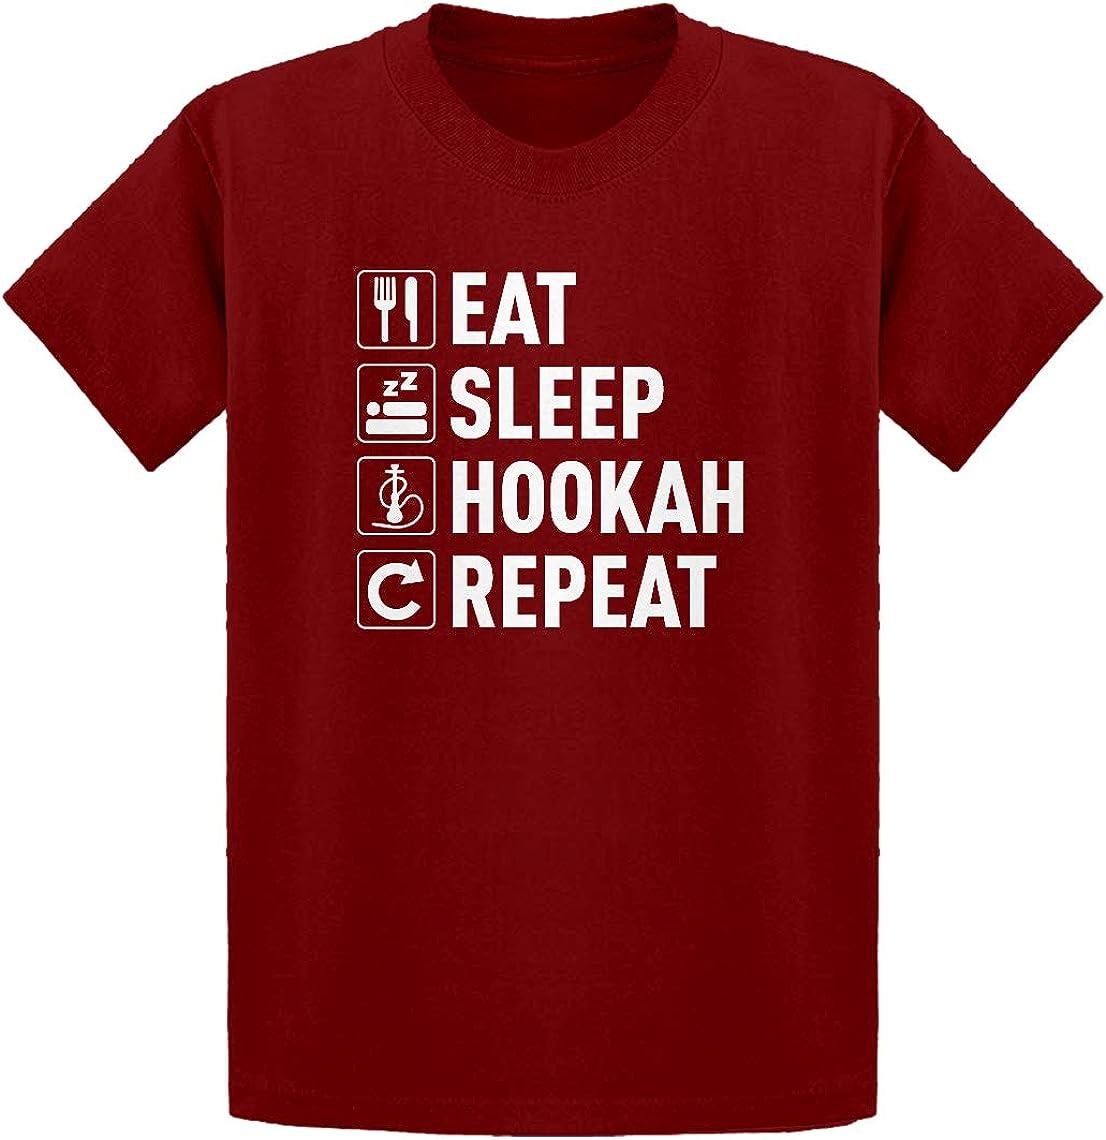 Youth Eat Sleep Hookah Youth M - (8-10) Red Kids T-Shirt